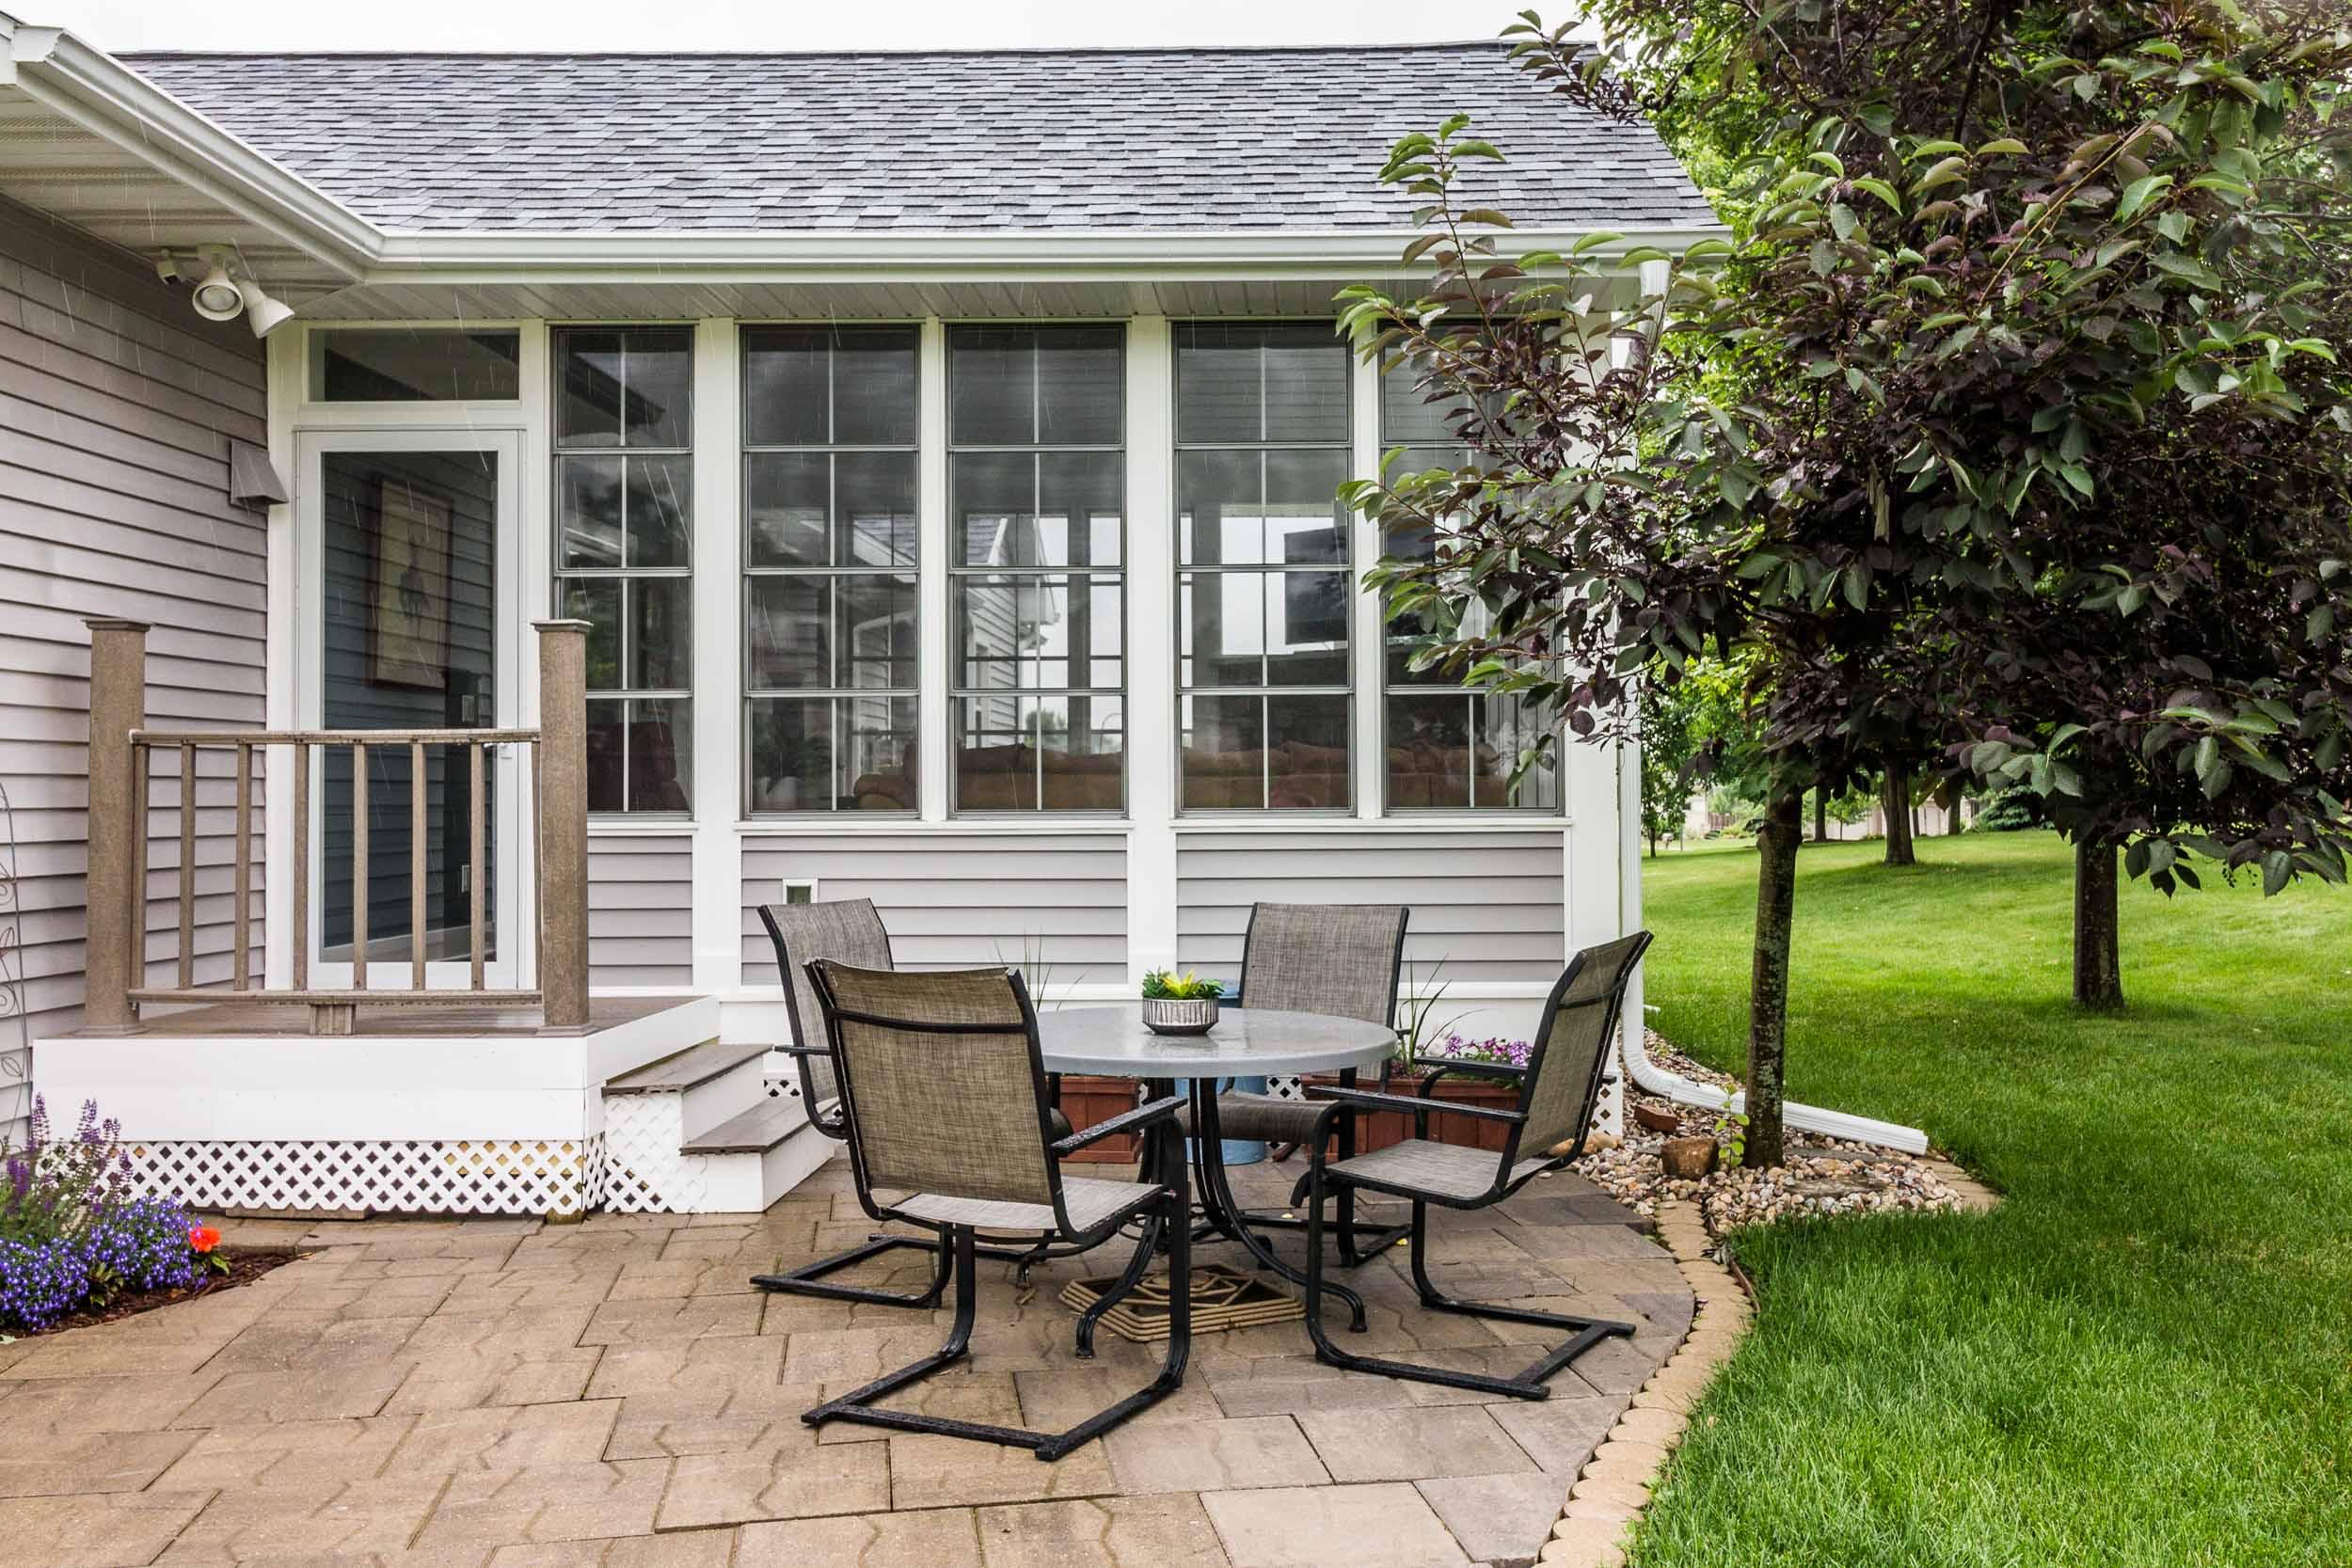 Three Season Porch With Adjacent Patio